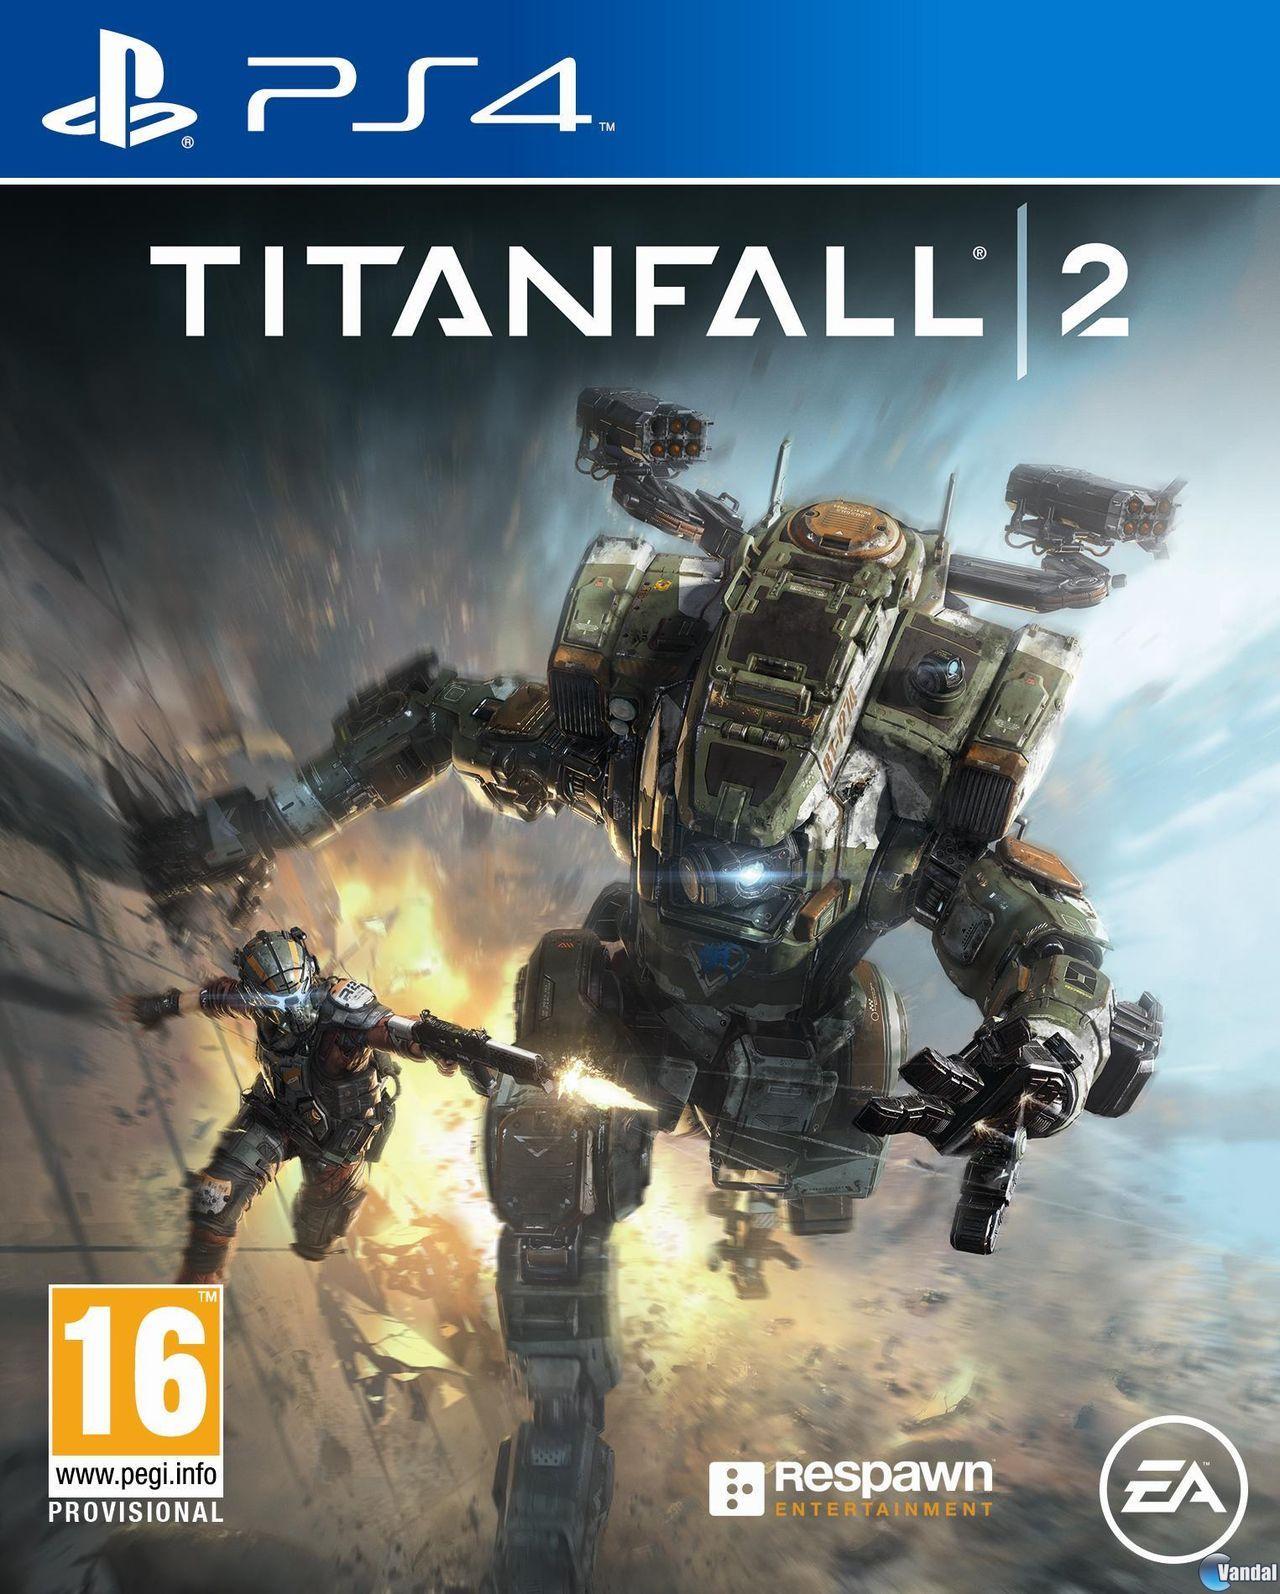 titanfall-2-box